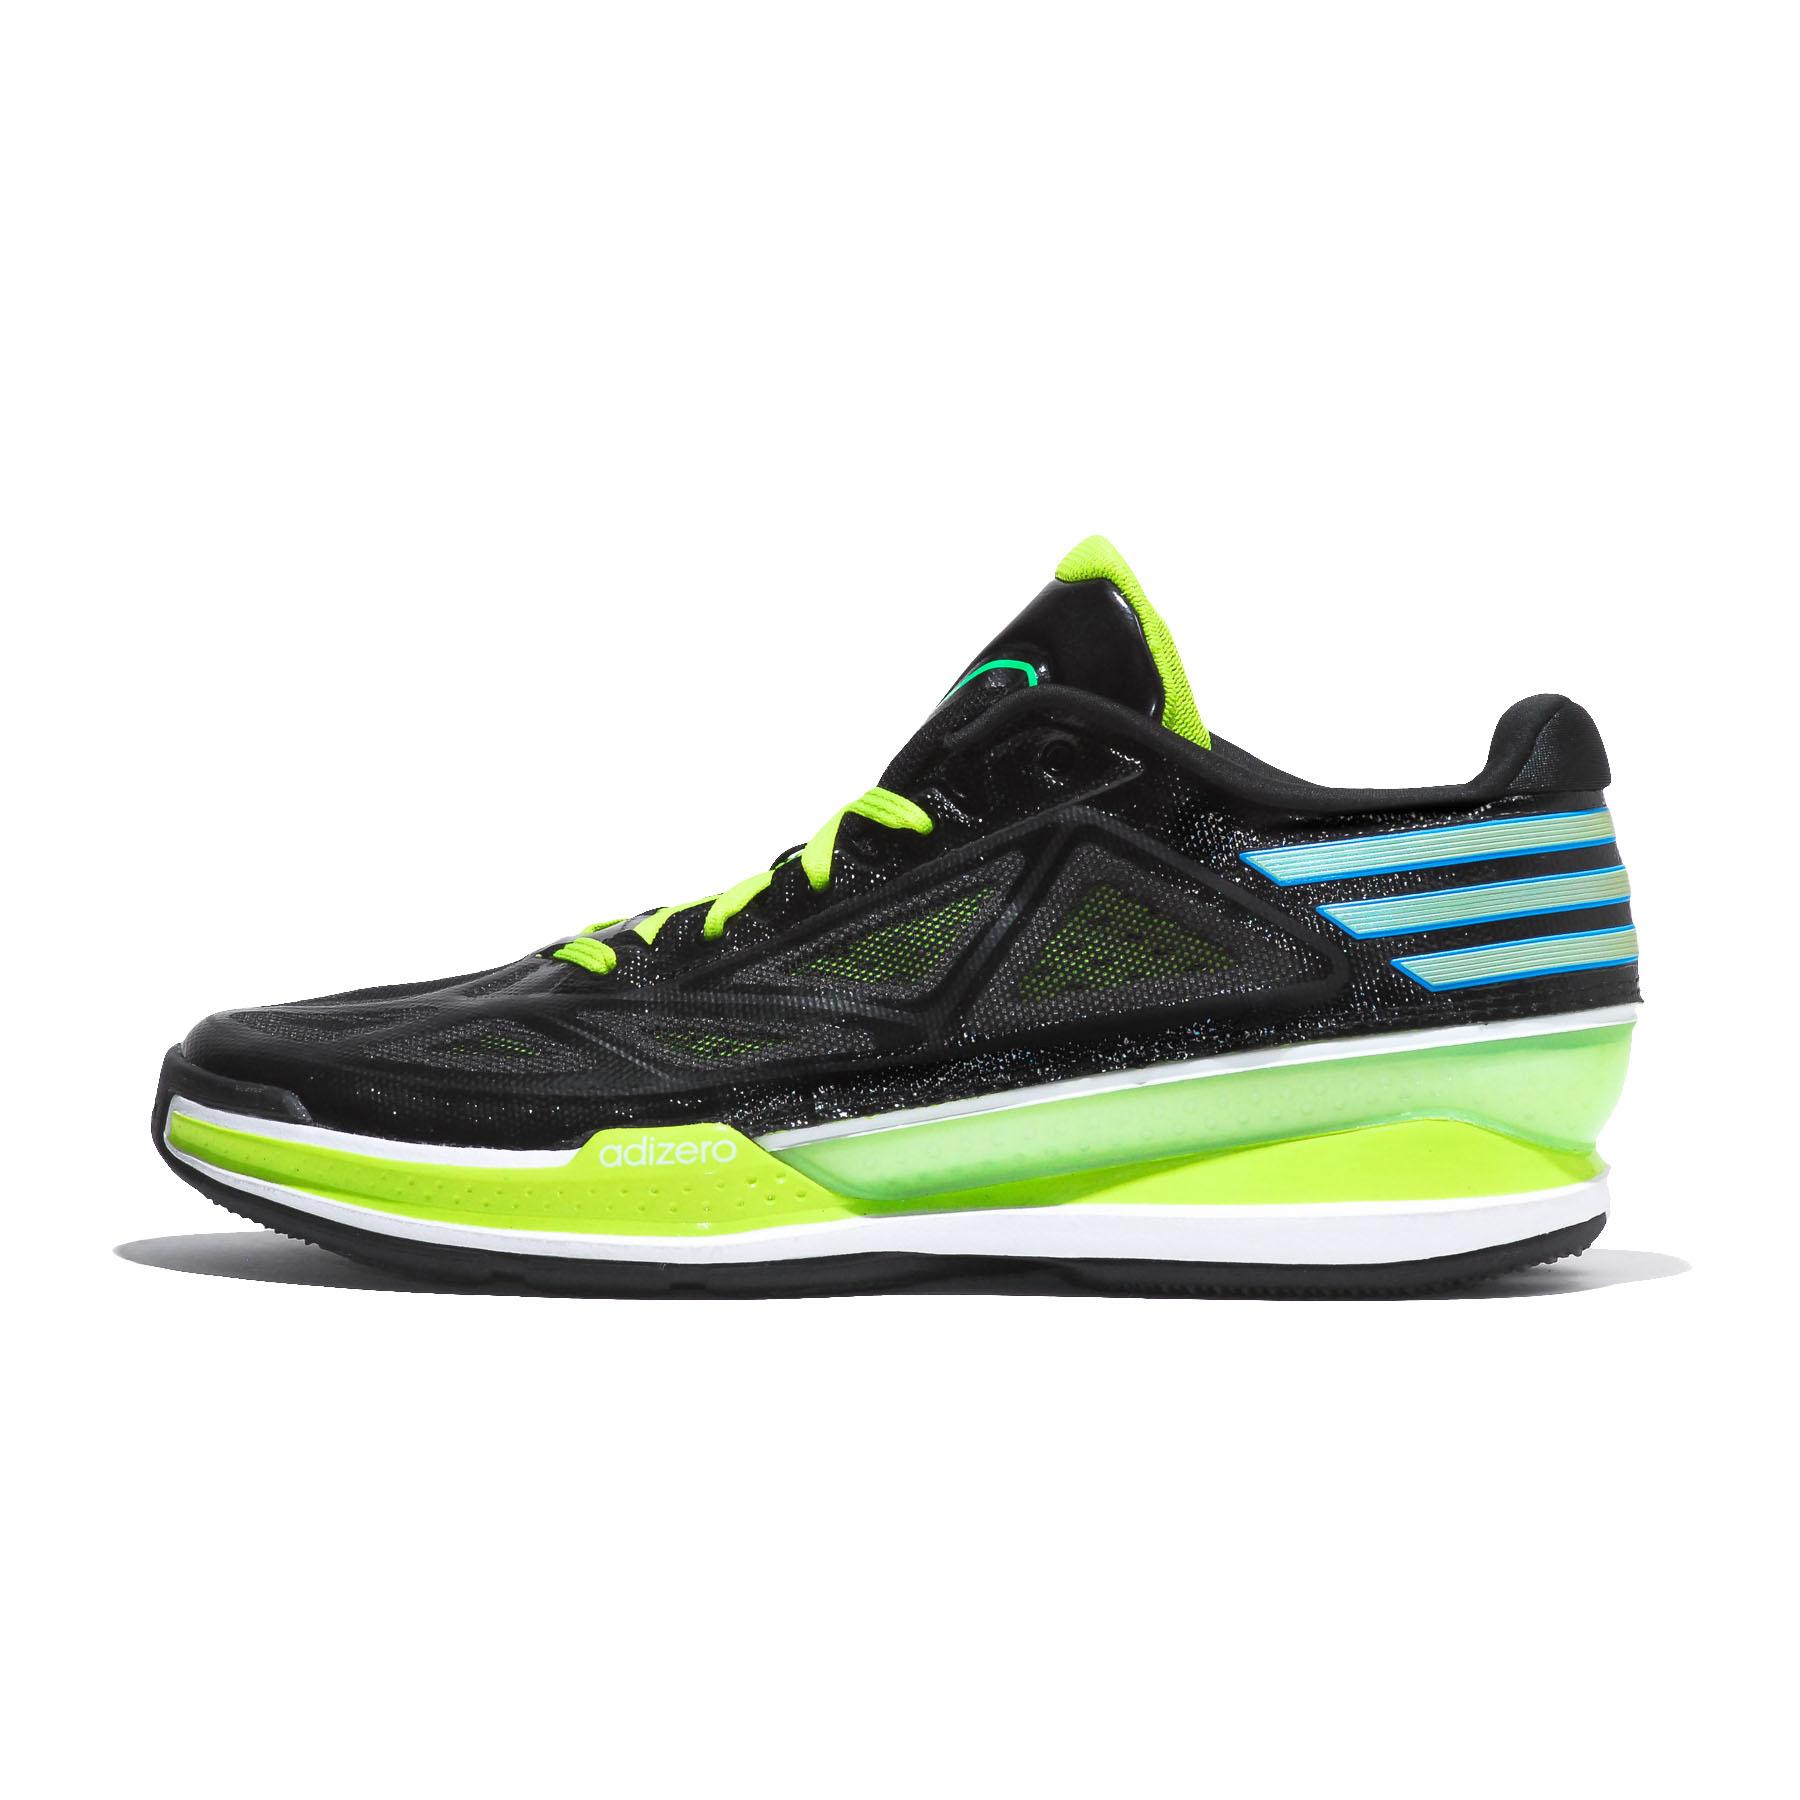 adidas-jl7-quickvsfast-21